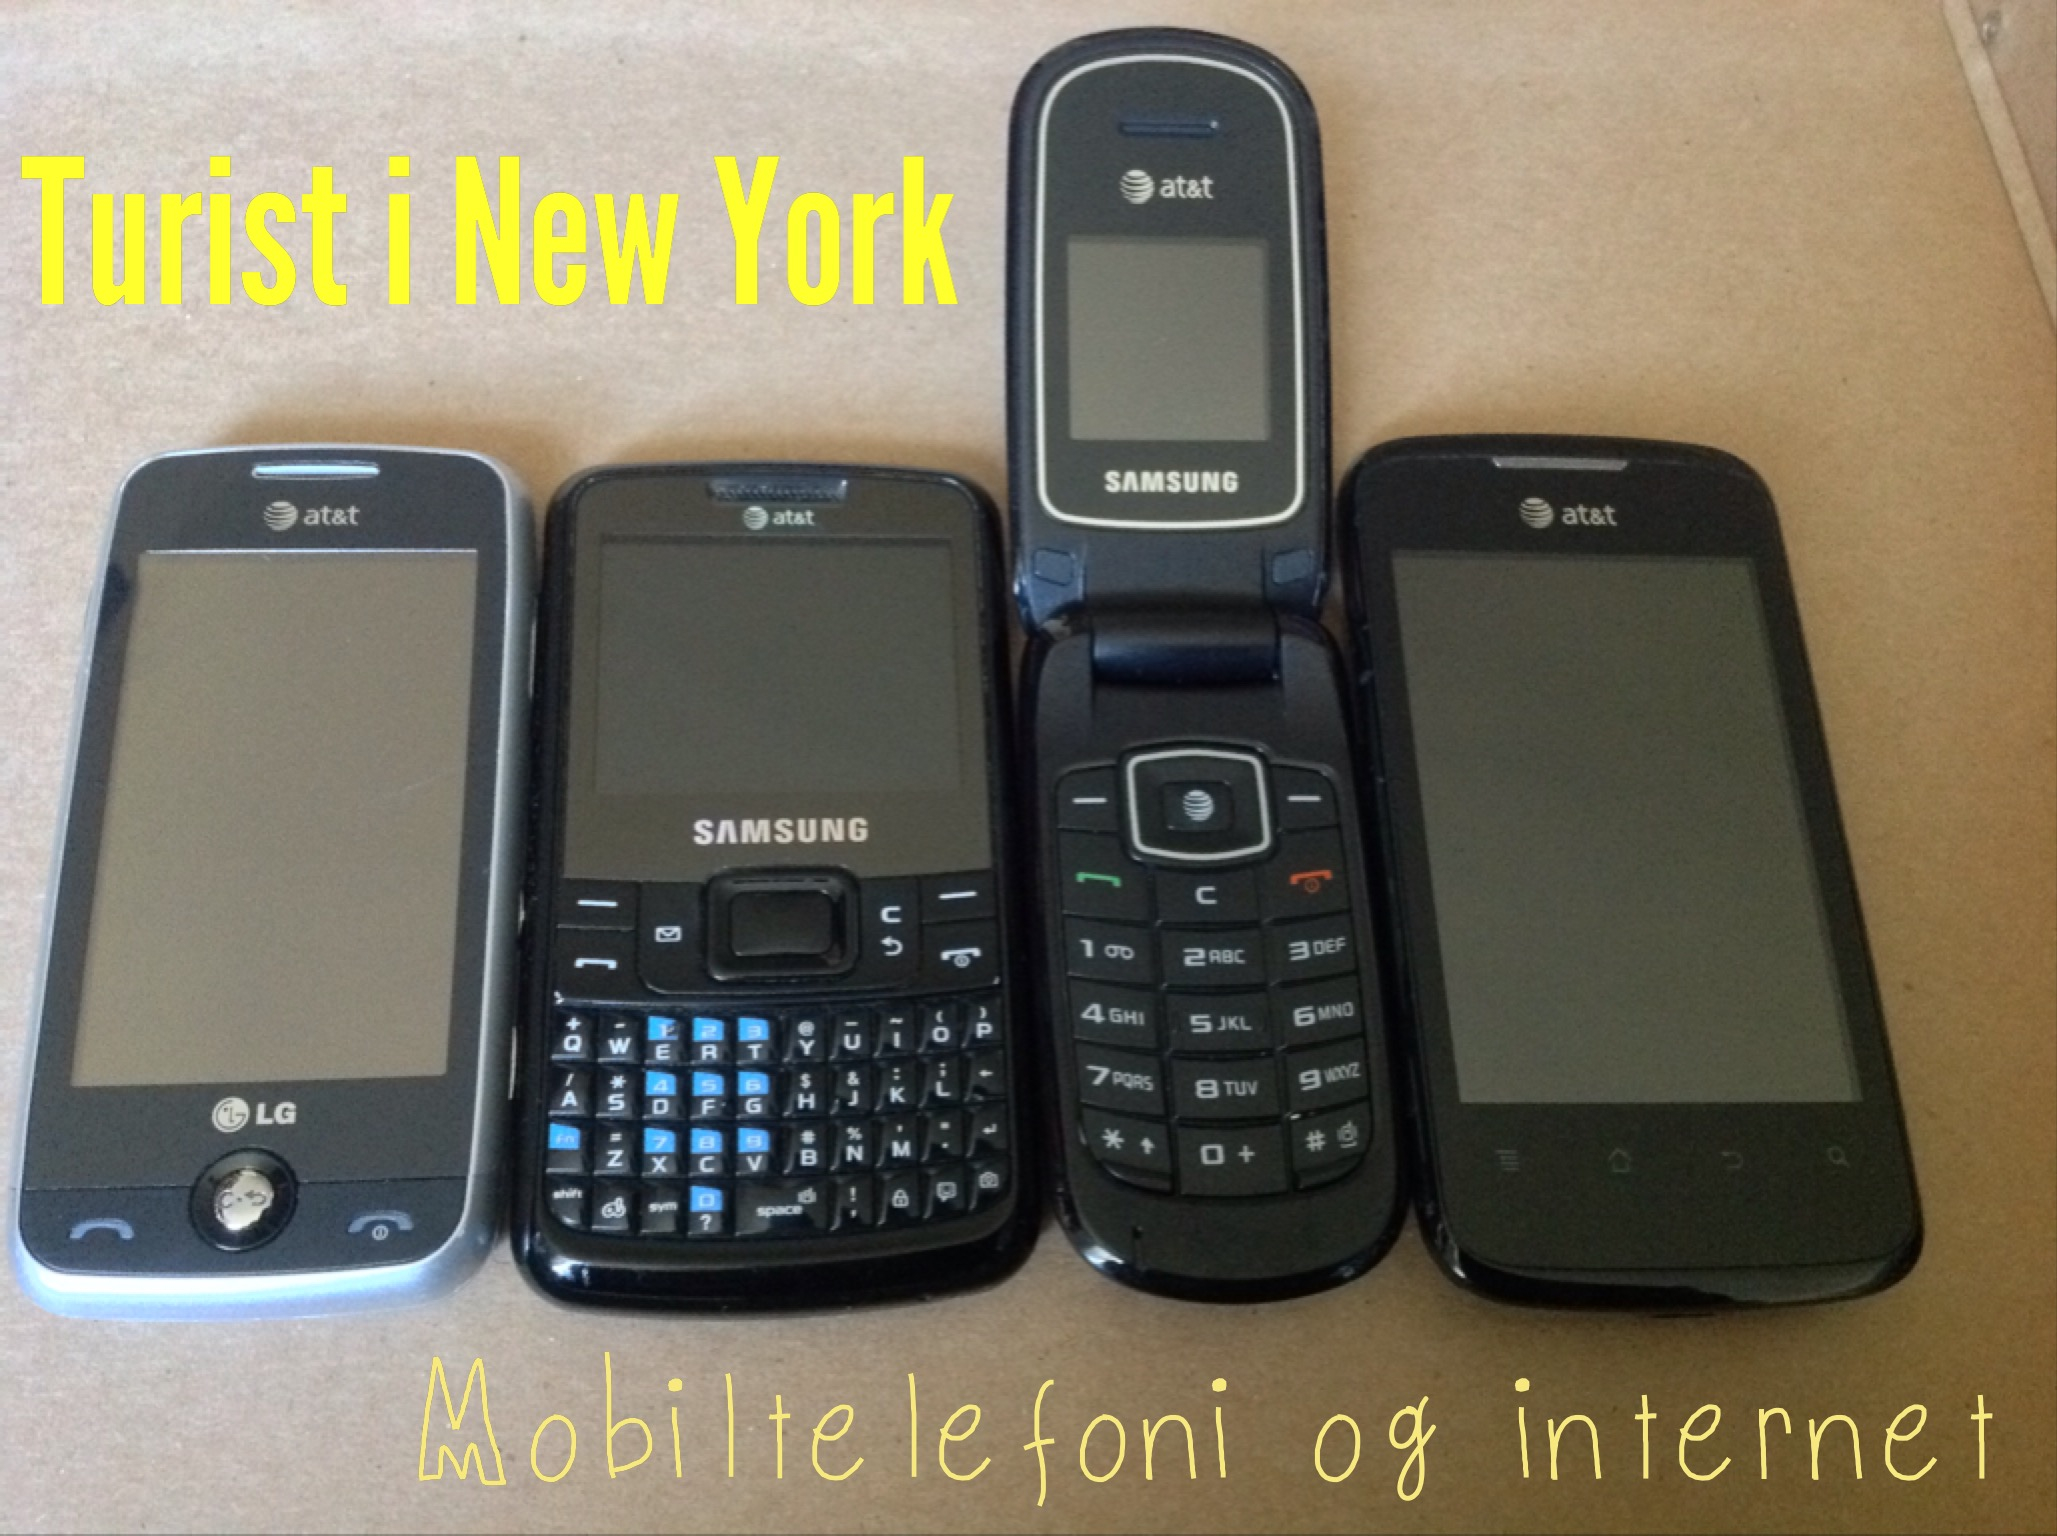 Mobiltelefoni & Internet i USA